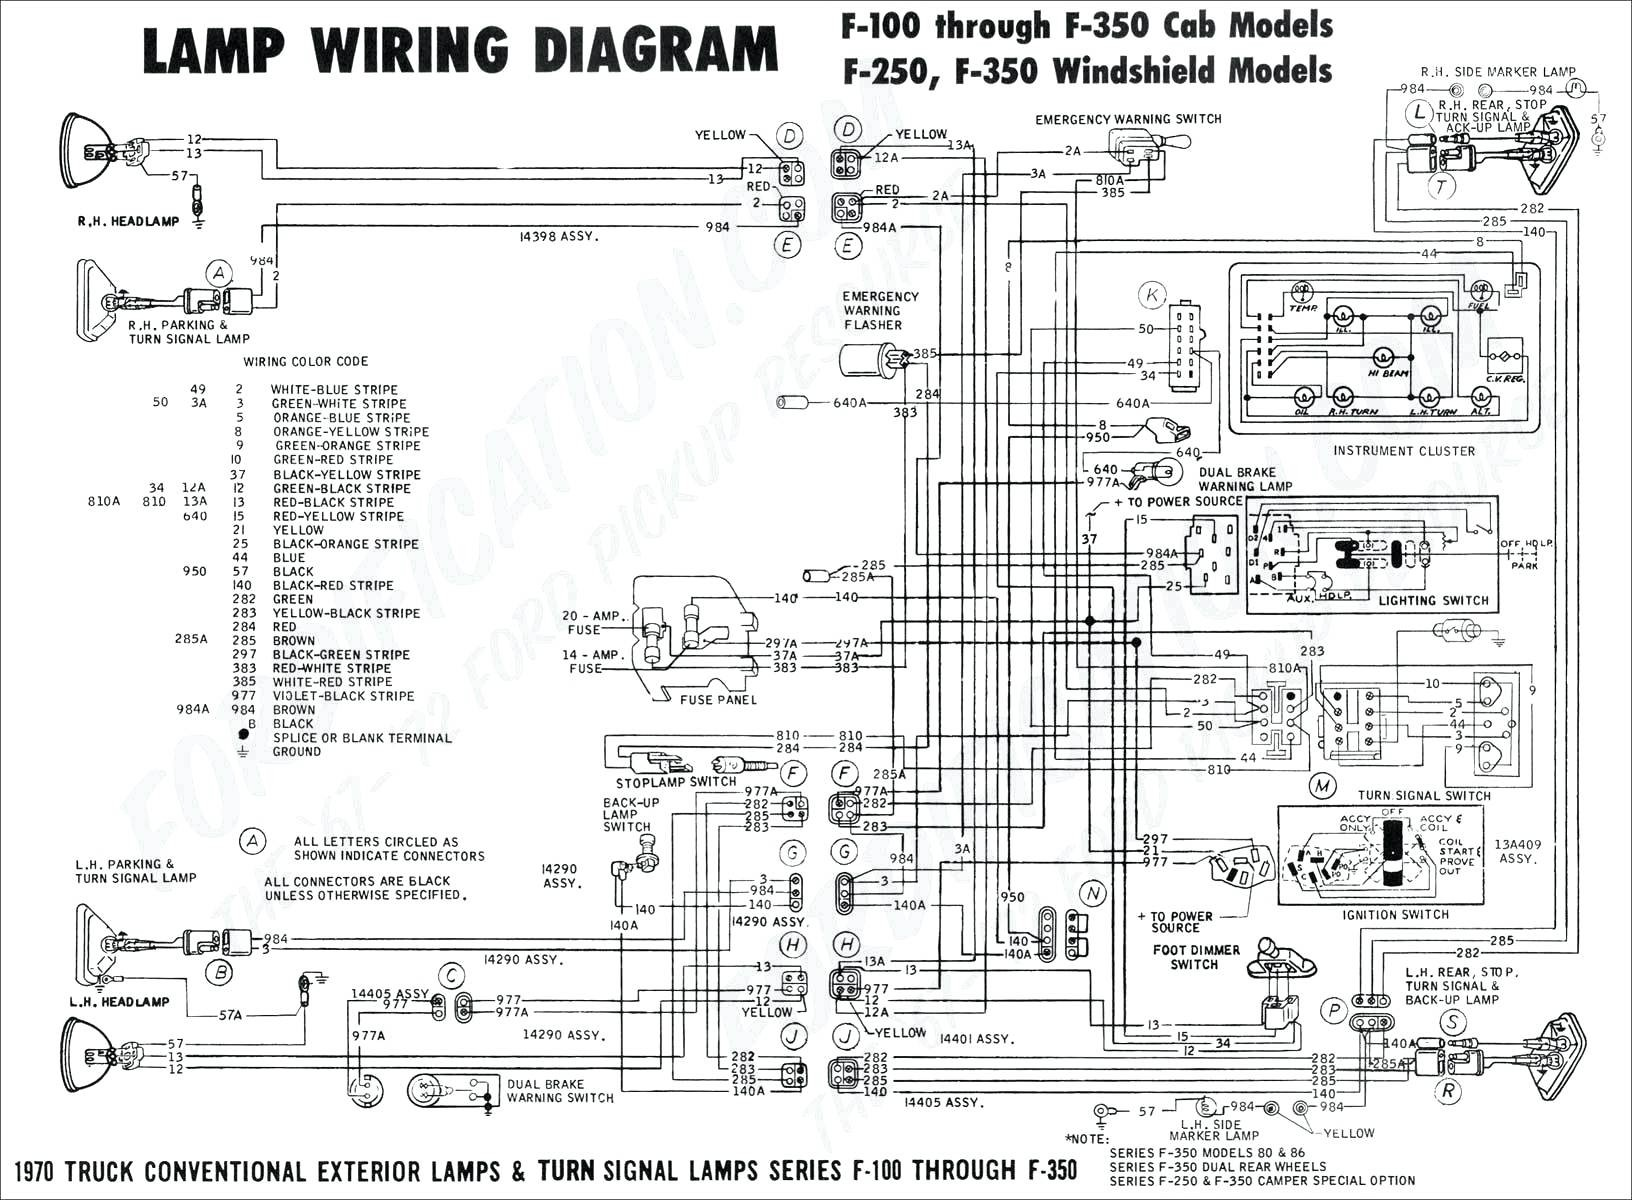 2003 Silverado 1500hd Brake Light Schematic Diagram] 2005 Dodge Ram 2500 Electrical Diagram Full Version Of 2003 Silverado 1500hd Brake Light Schematic